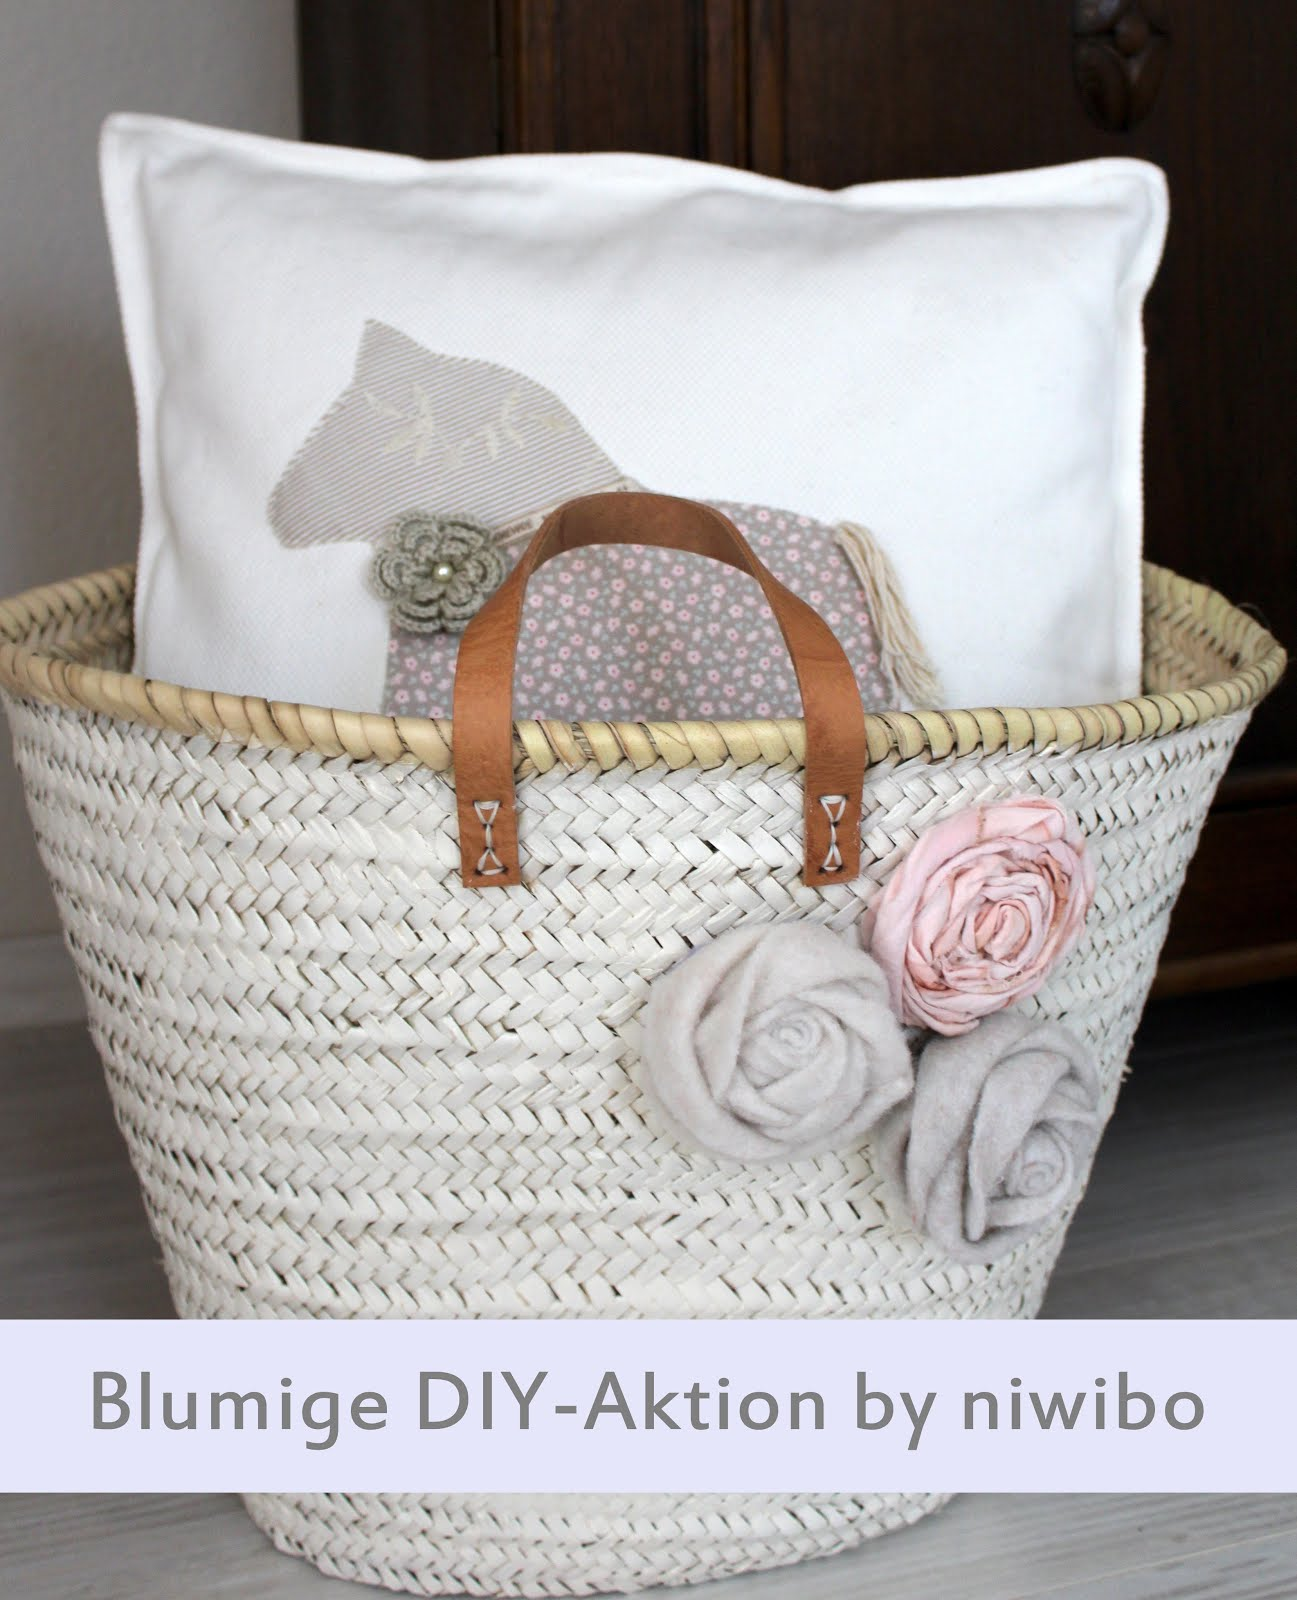 Blumige DIY-Aktion